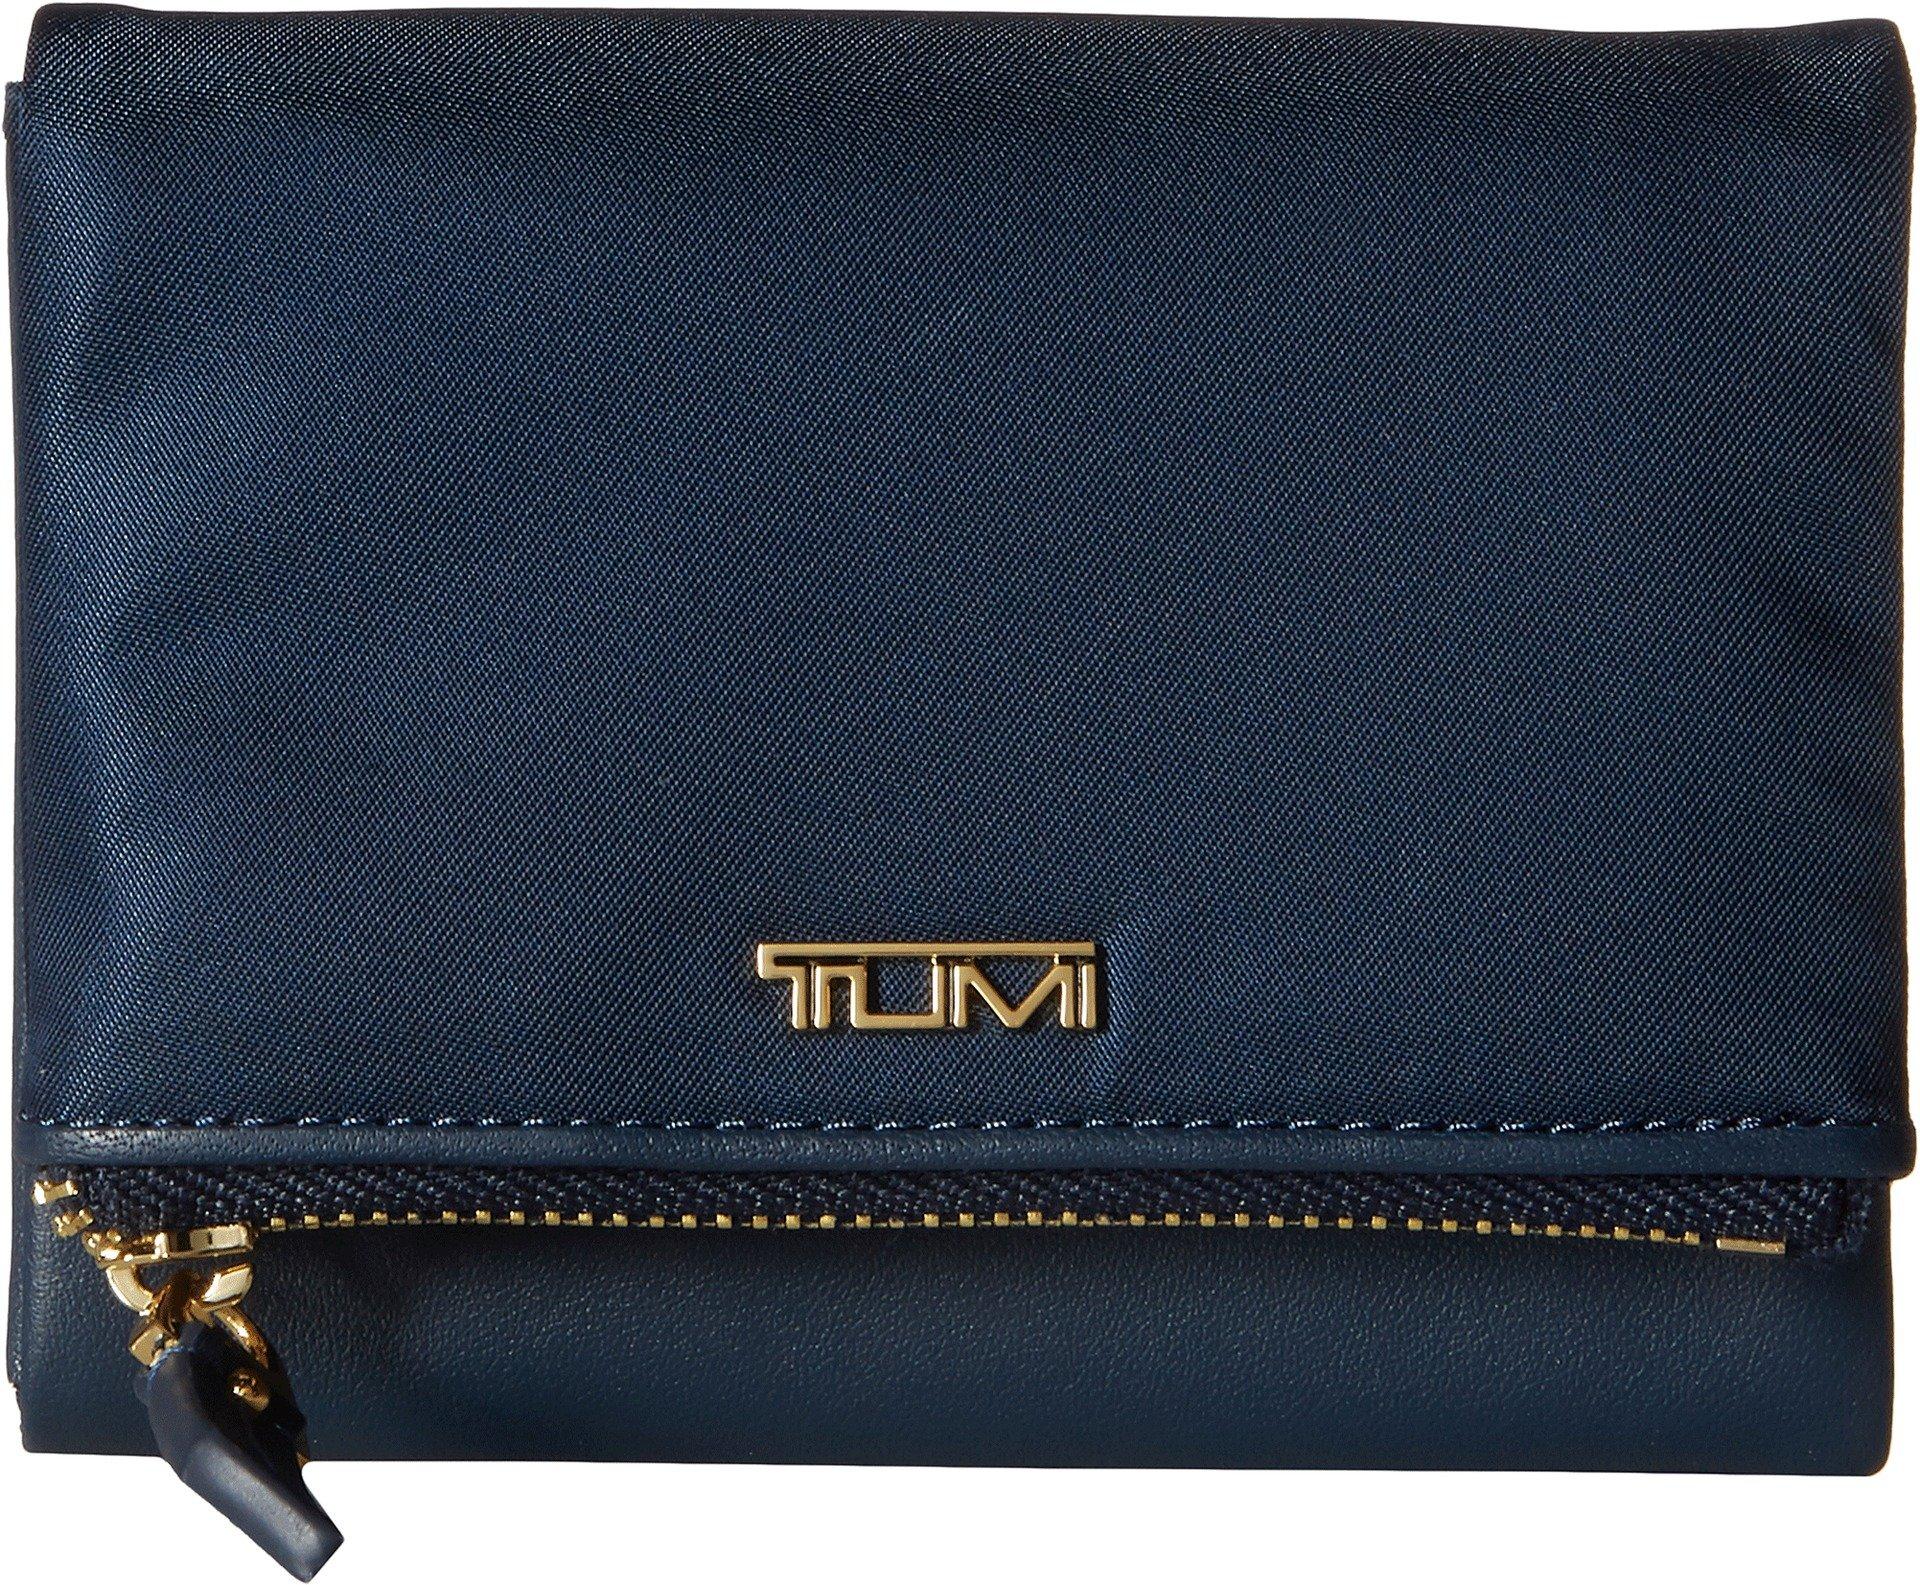 Tumi Women's Voyageur Flap Card Case Ocean Blue